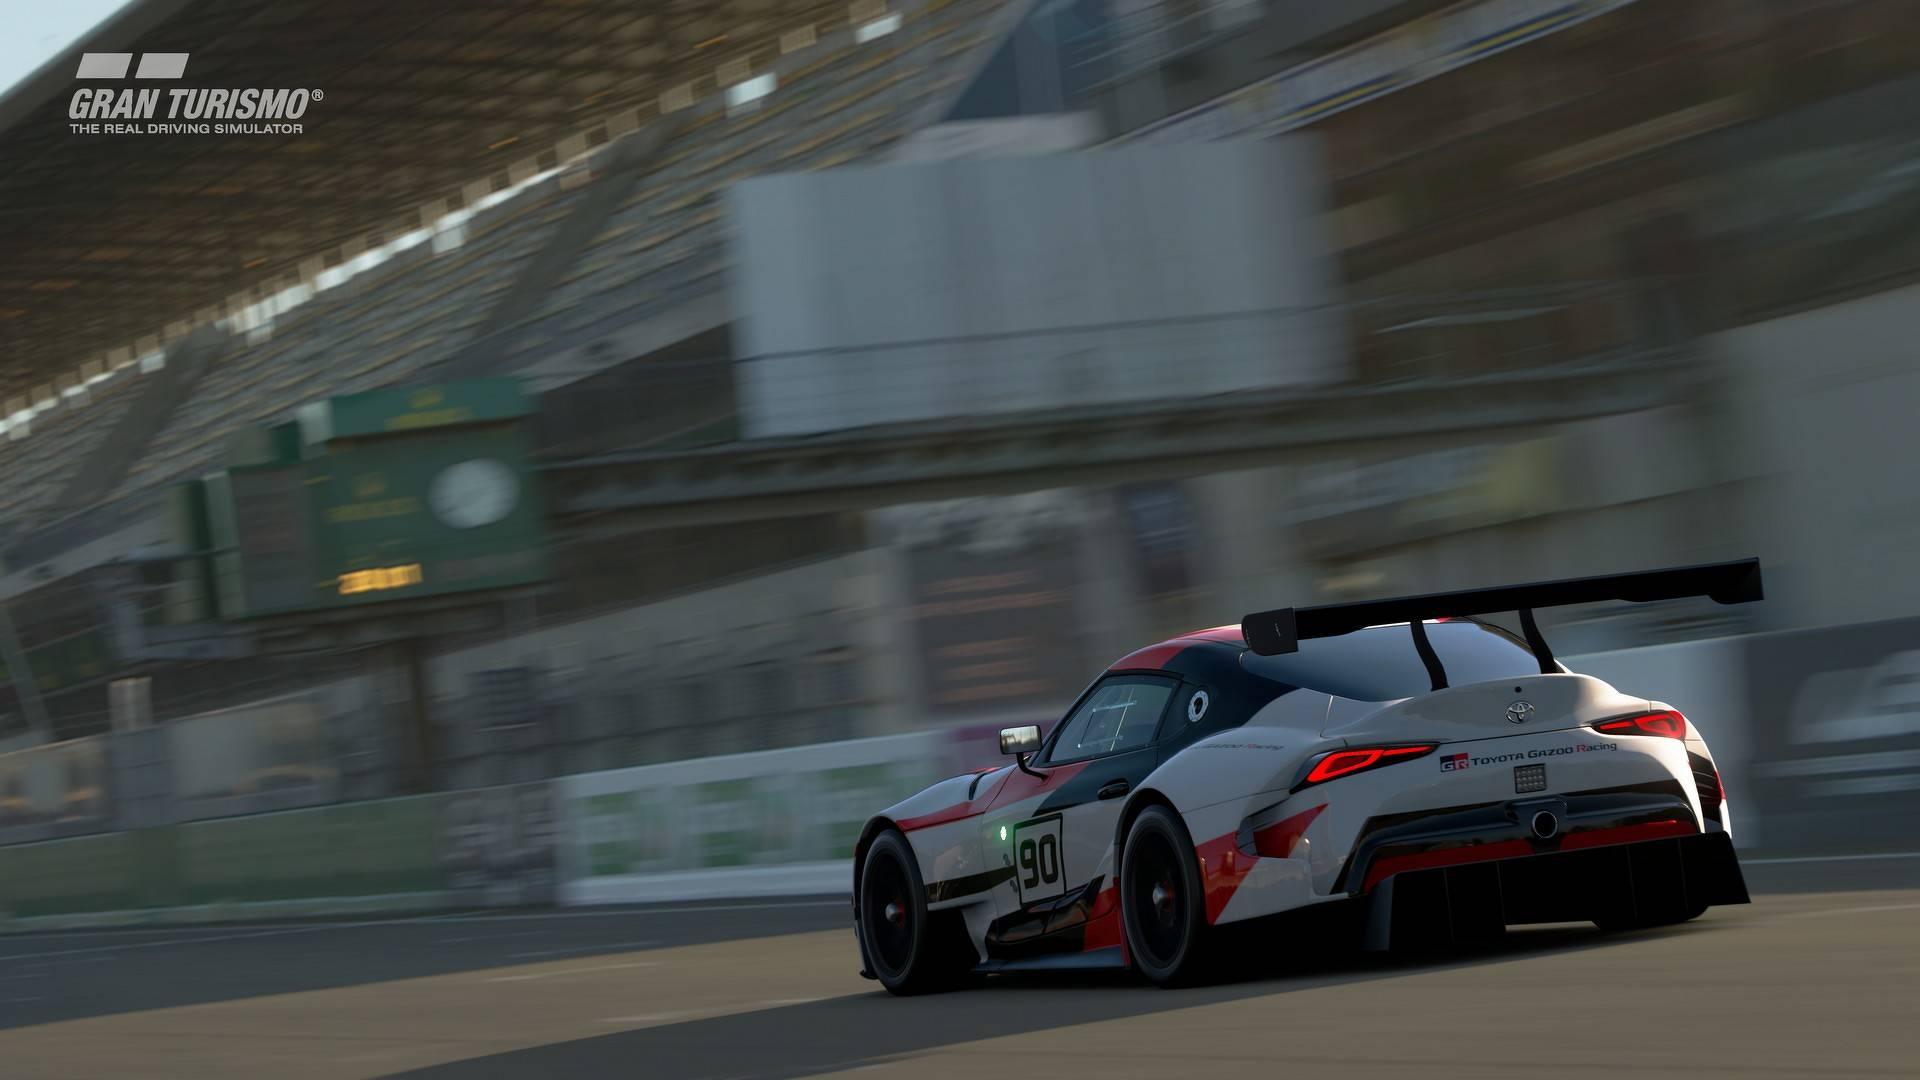 Toyota GR Supra Racing Concept in GranTurismo Sport_0002